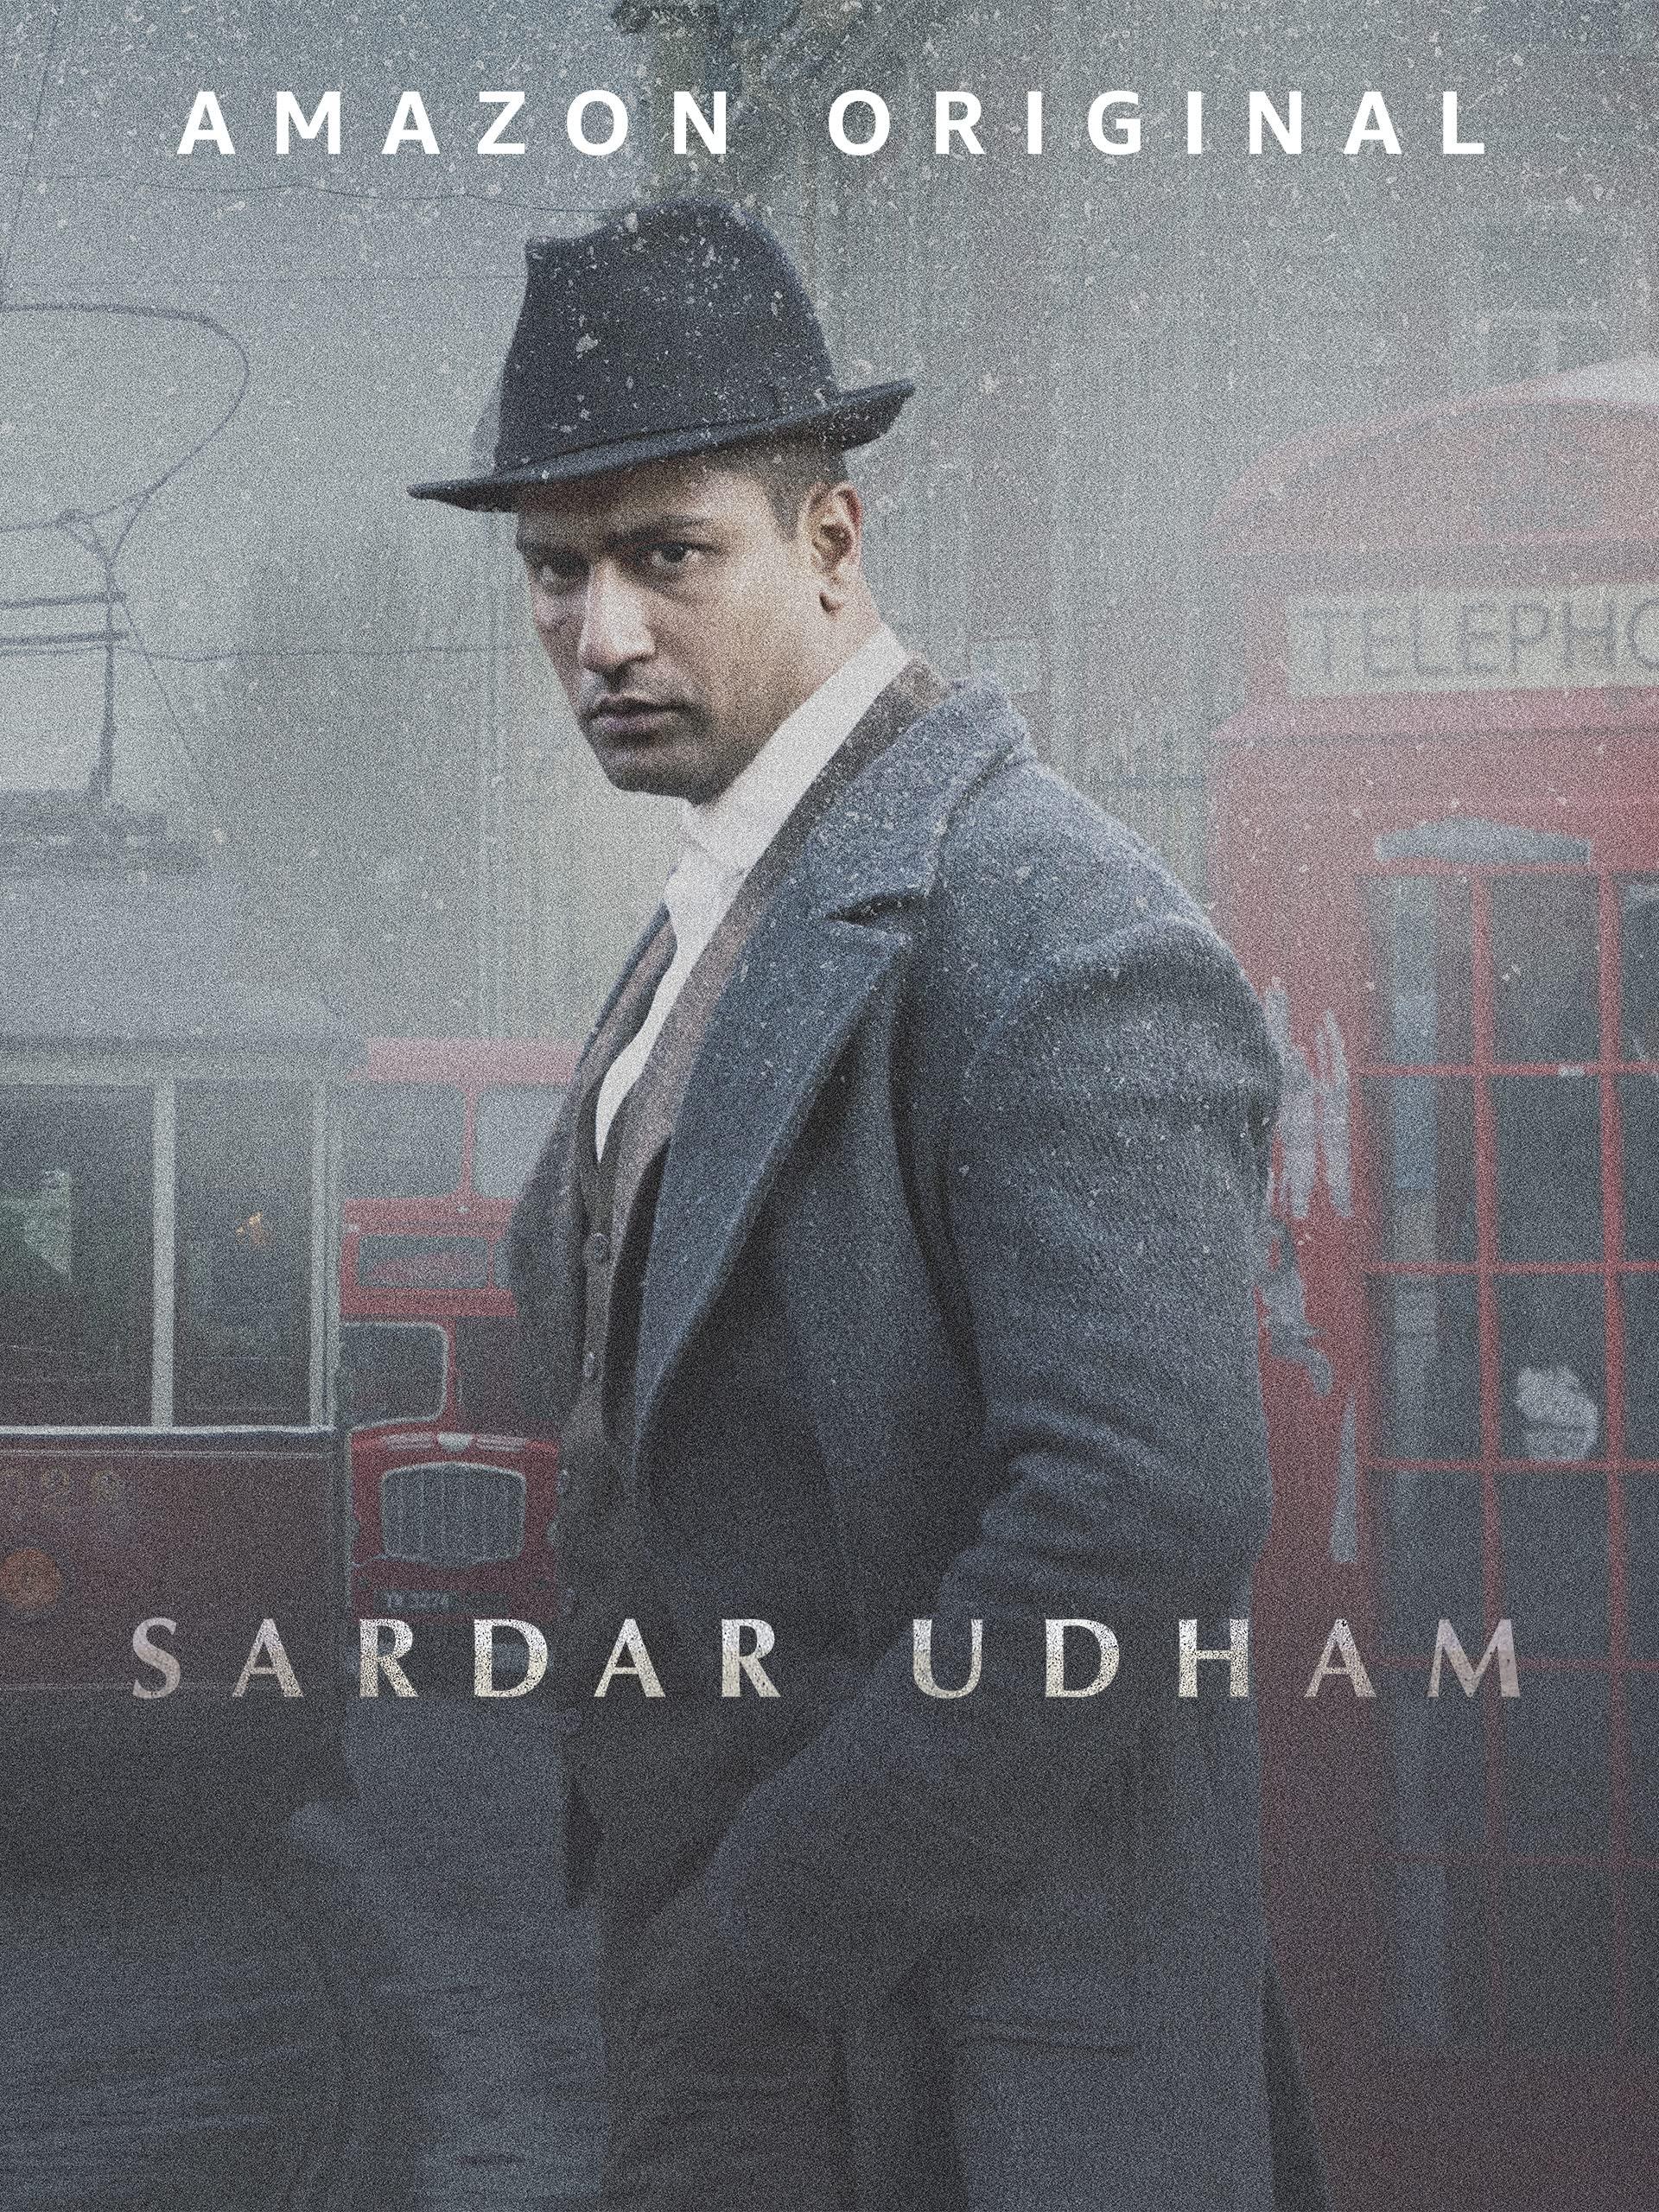 Sardar Udham (4K UHD) on Amazon Prime Instant Video UK